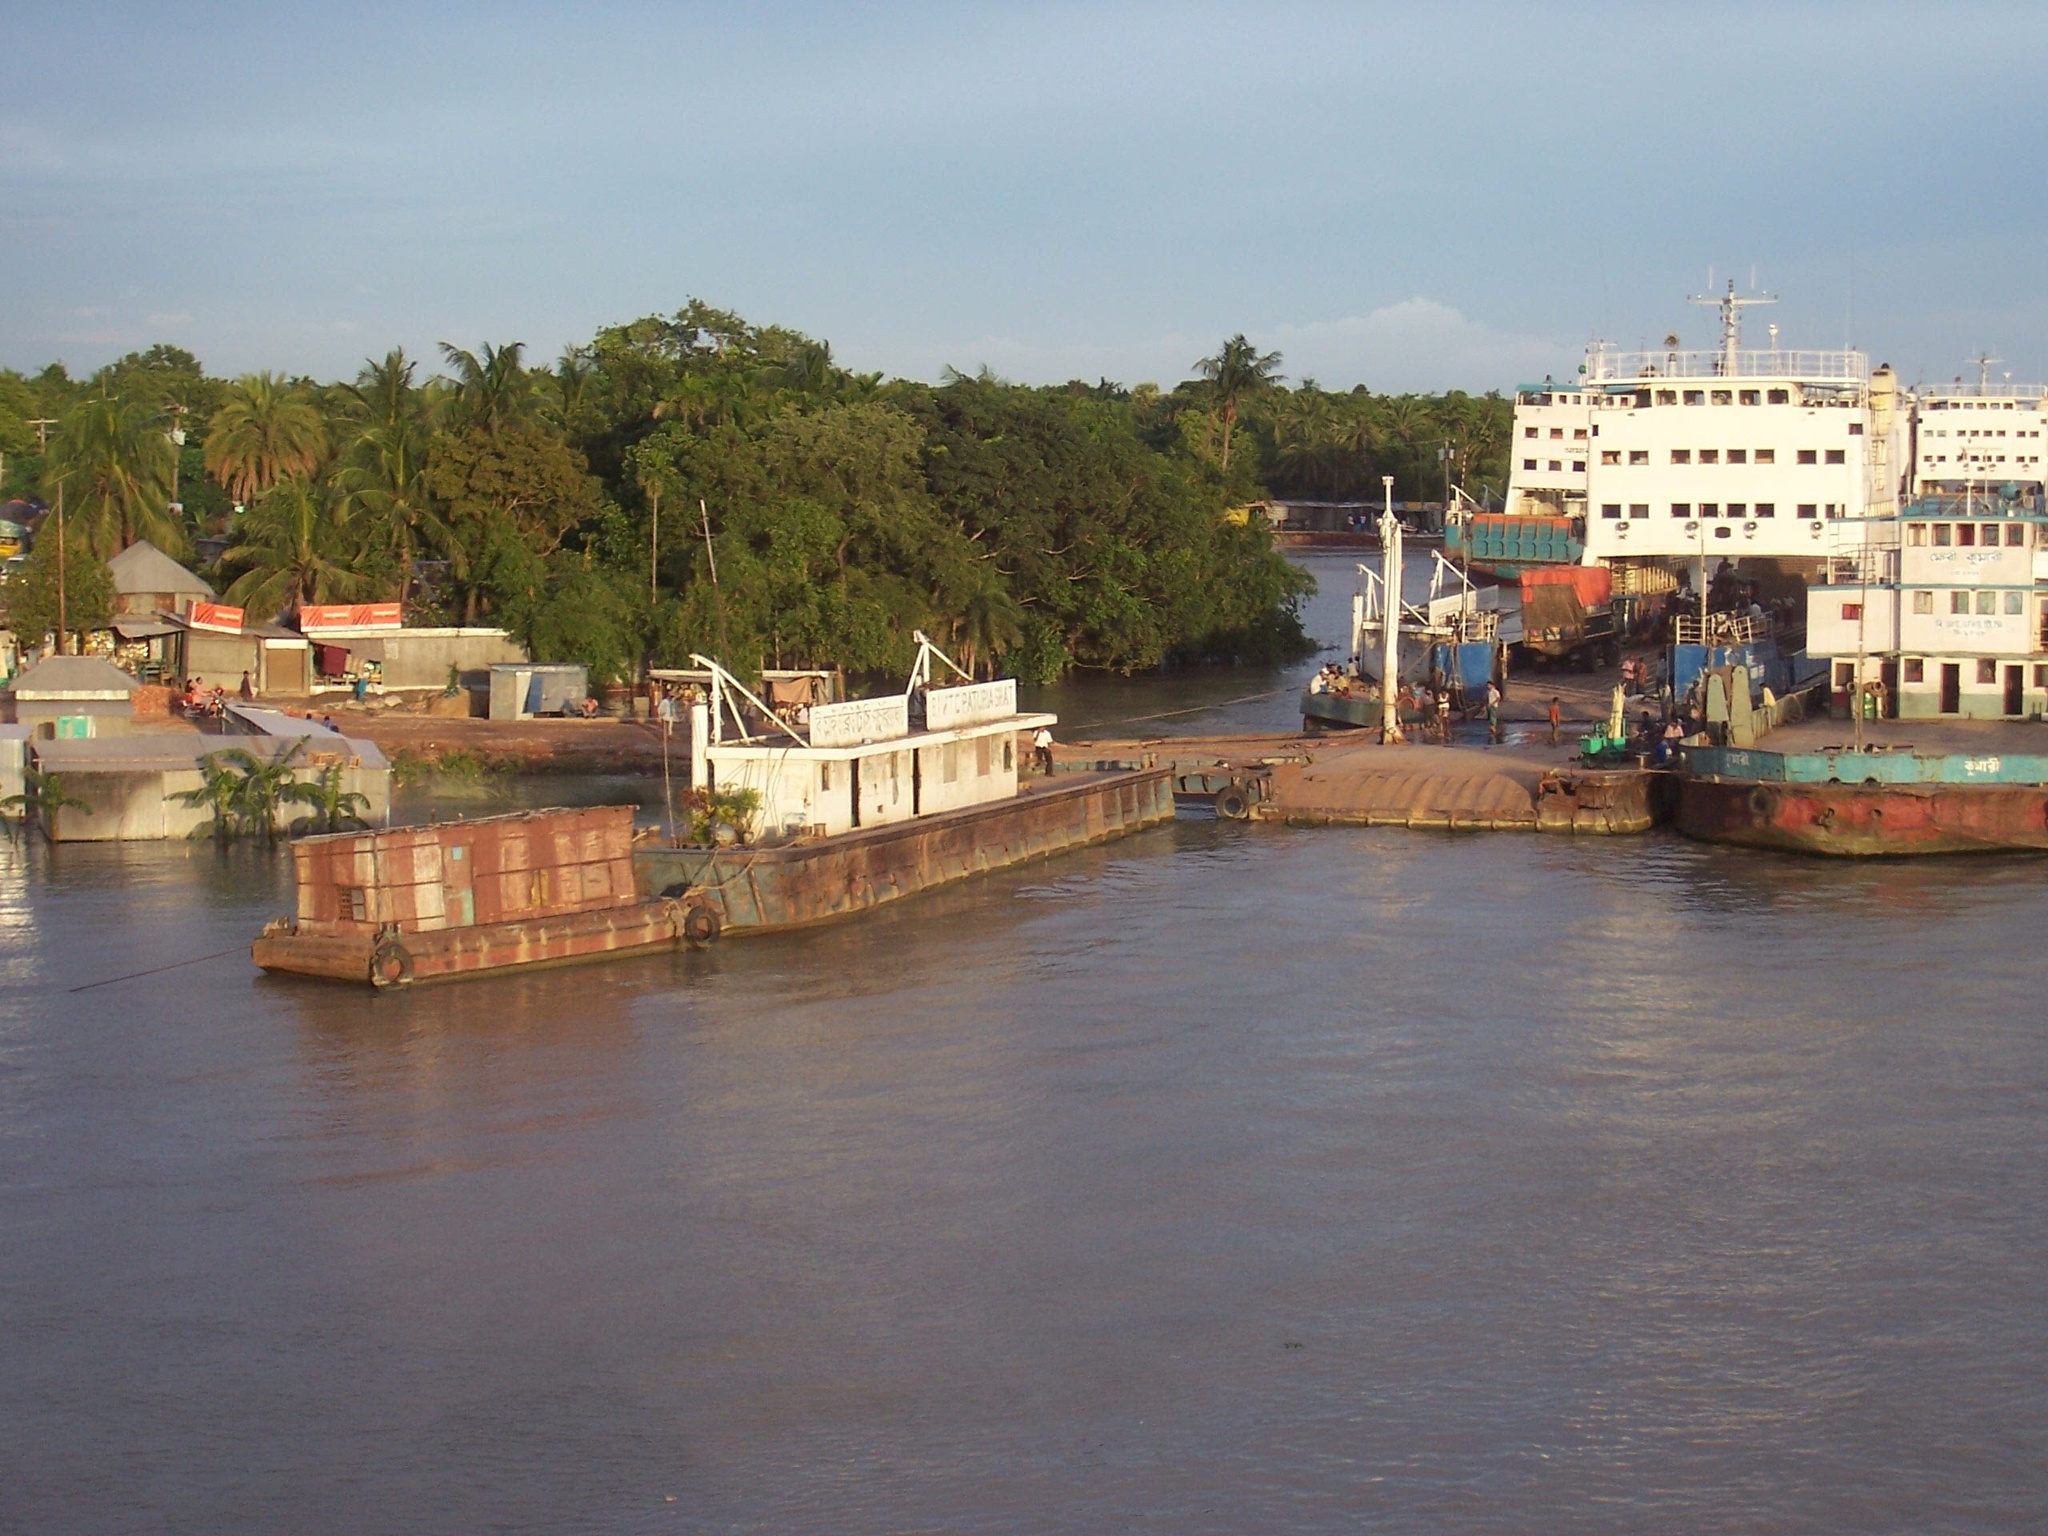 River Padma by zahid dr zaman